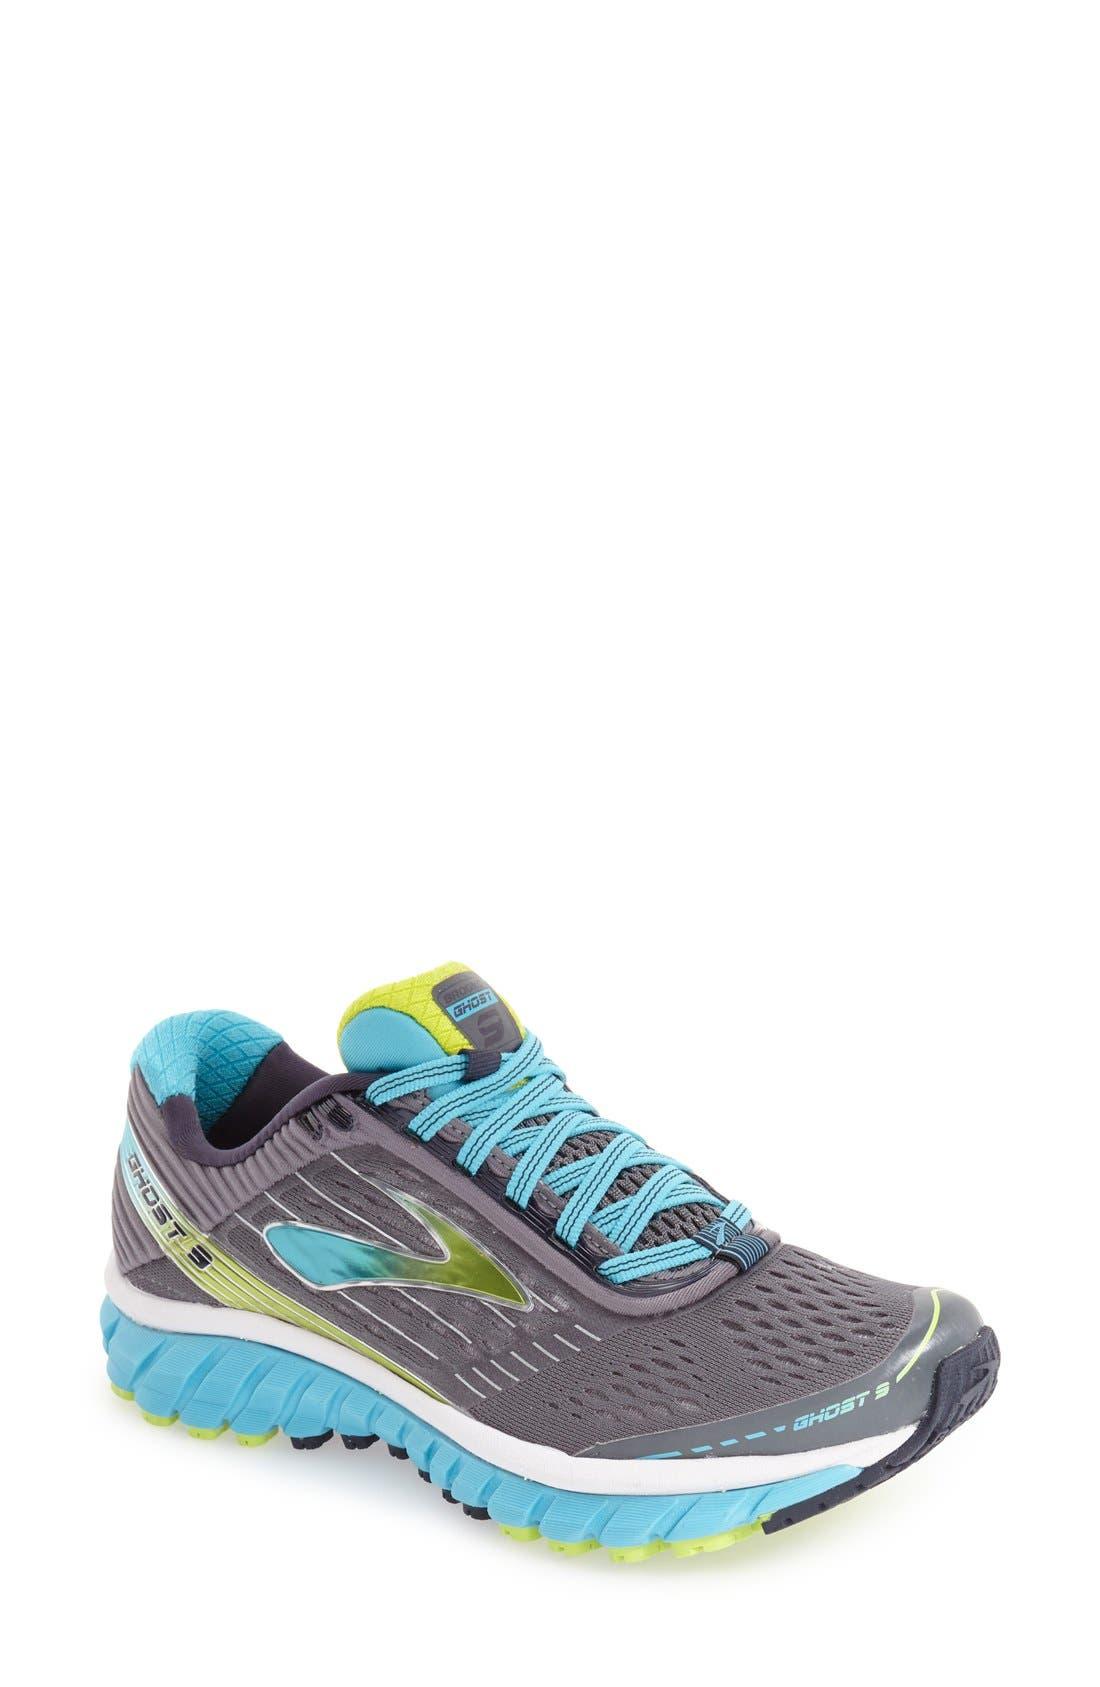 Brooks | Ghost 9 Running Shoe